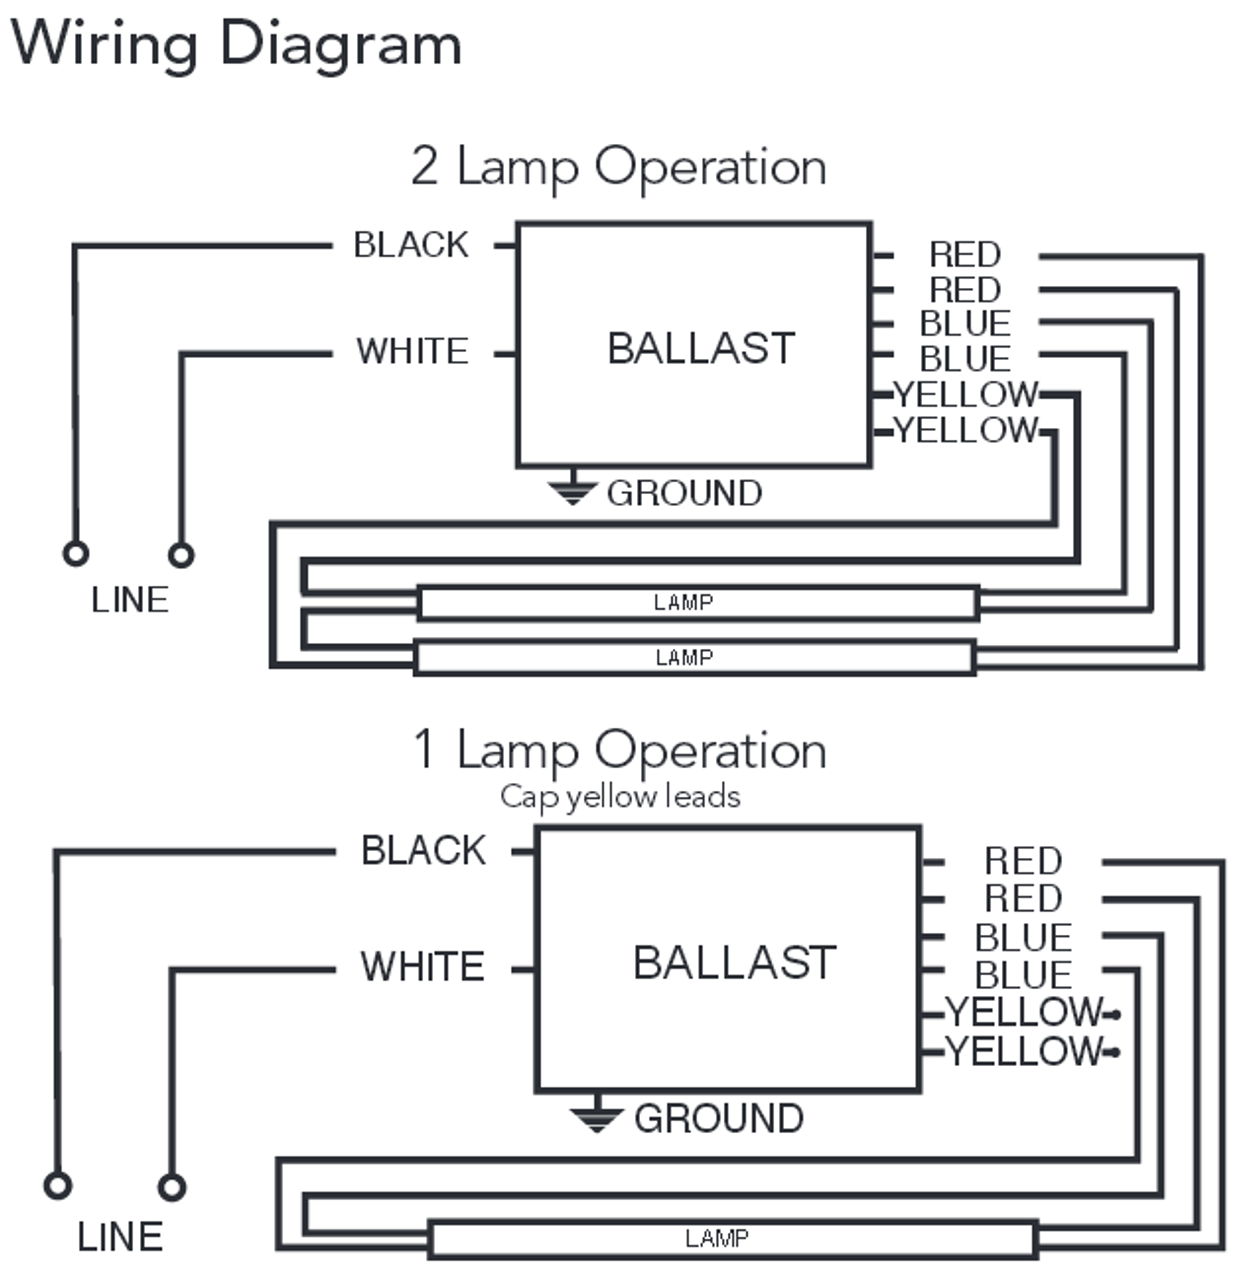 howard ep2 54ho prs mv w mc electronic f54t5ho ballast rh ballastshop com Advance T12 Ballast Wiring Diagram Advance T12 Ballast Wiring Diagram